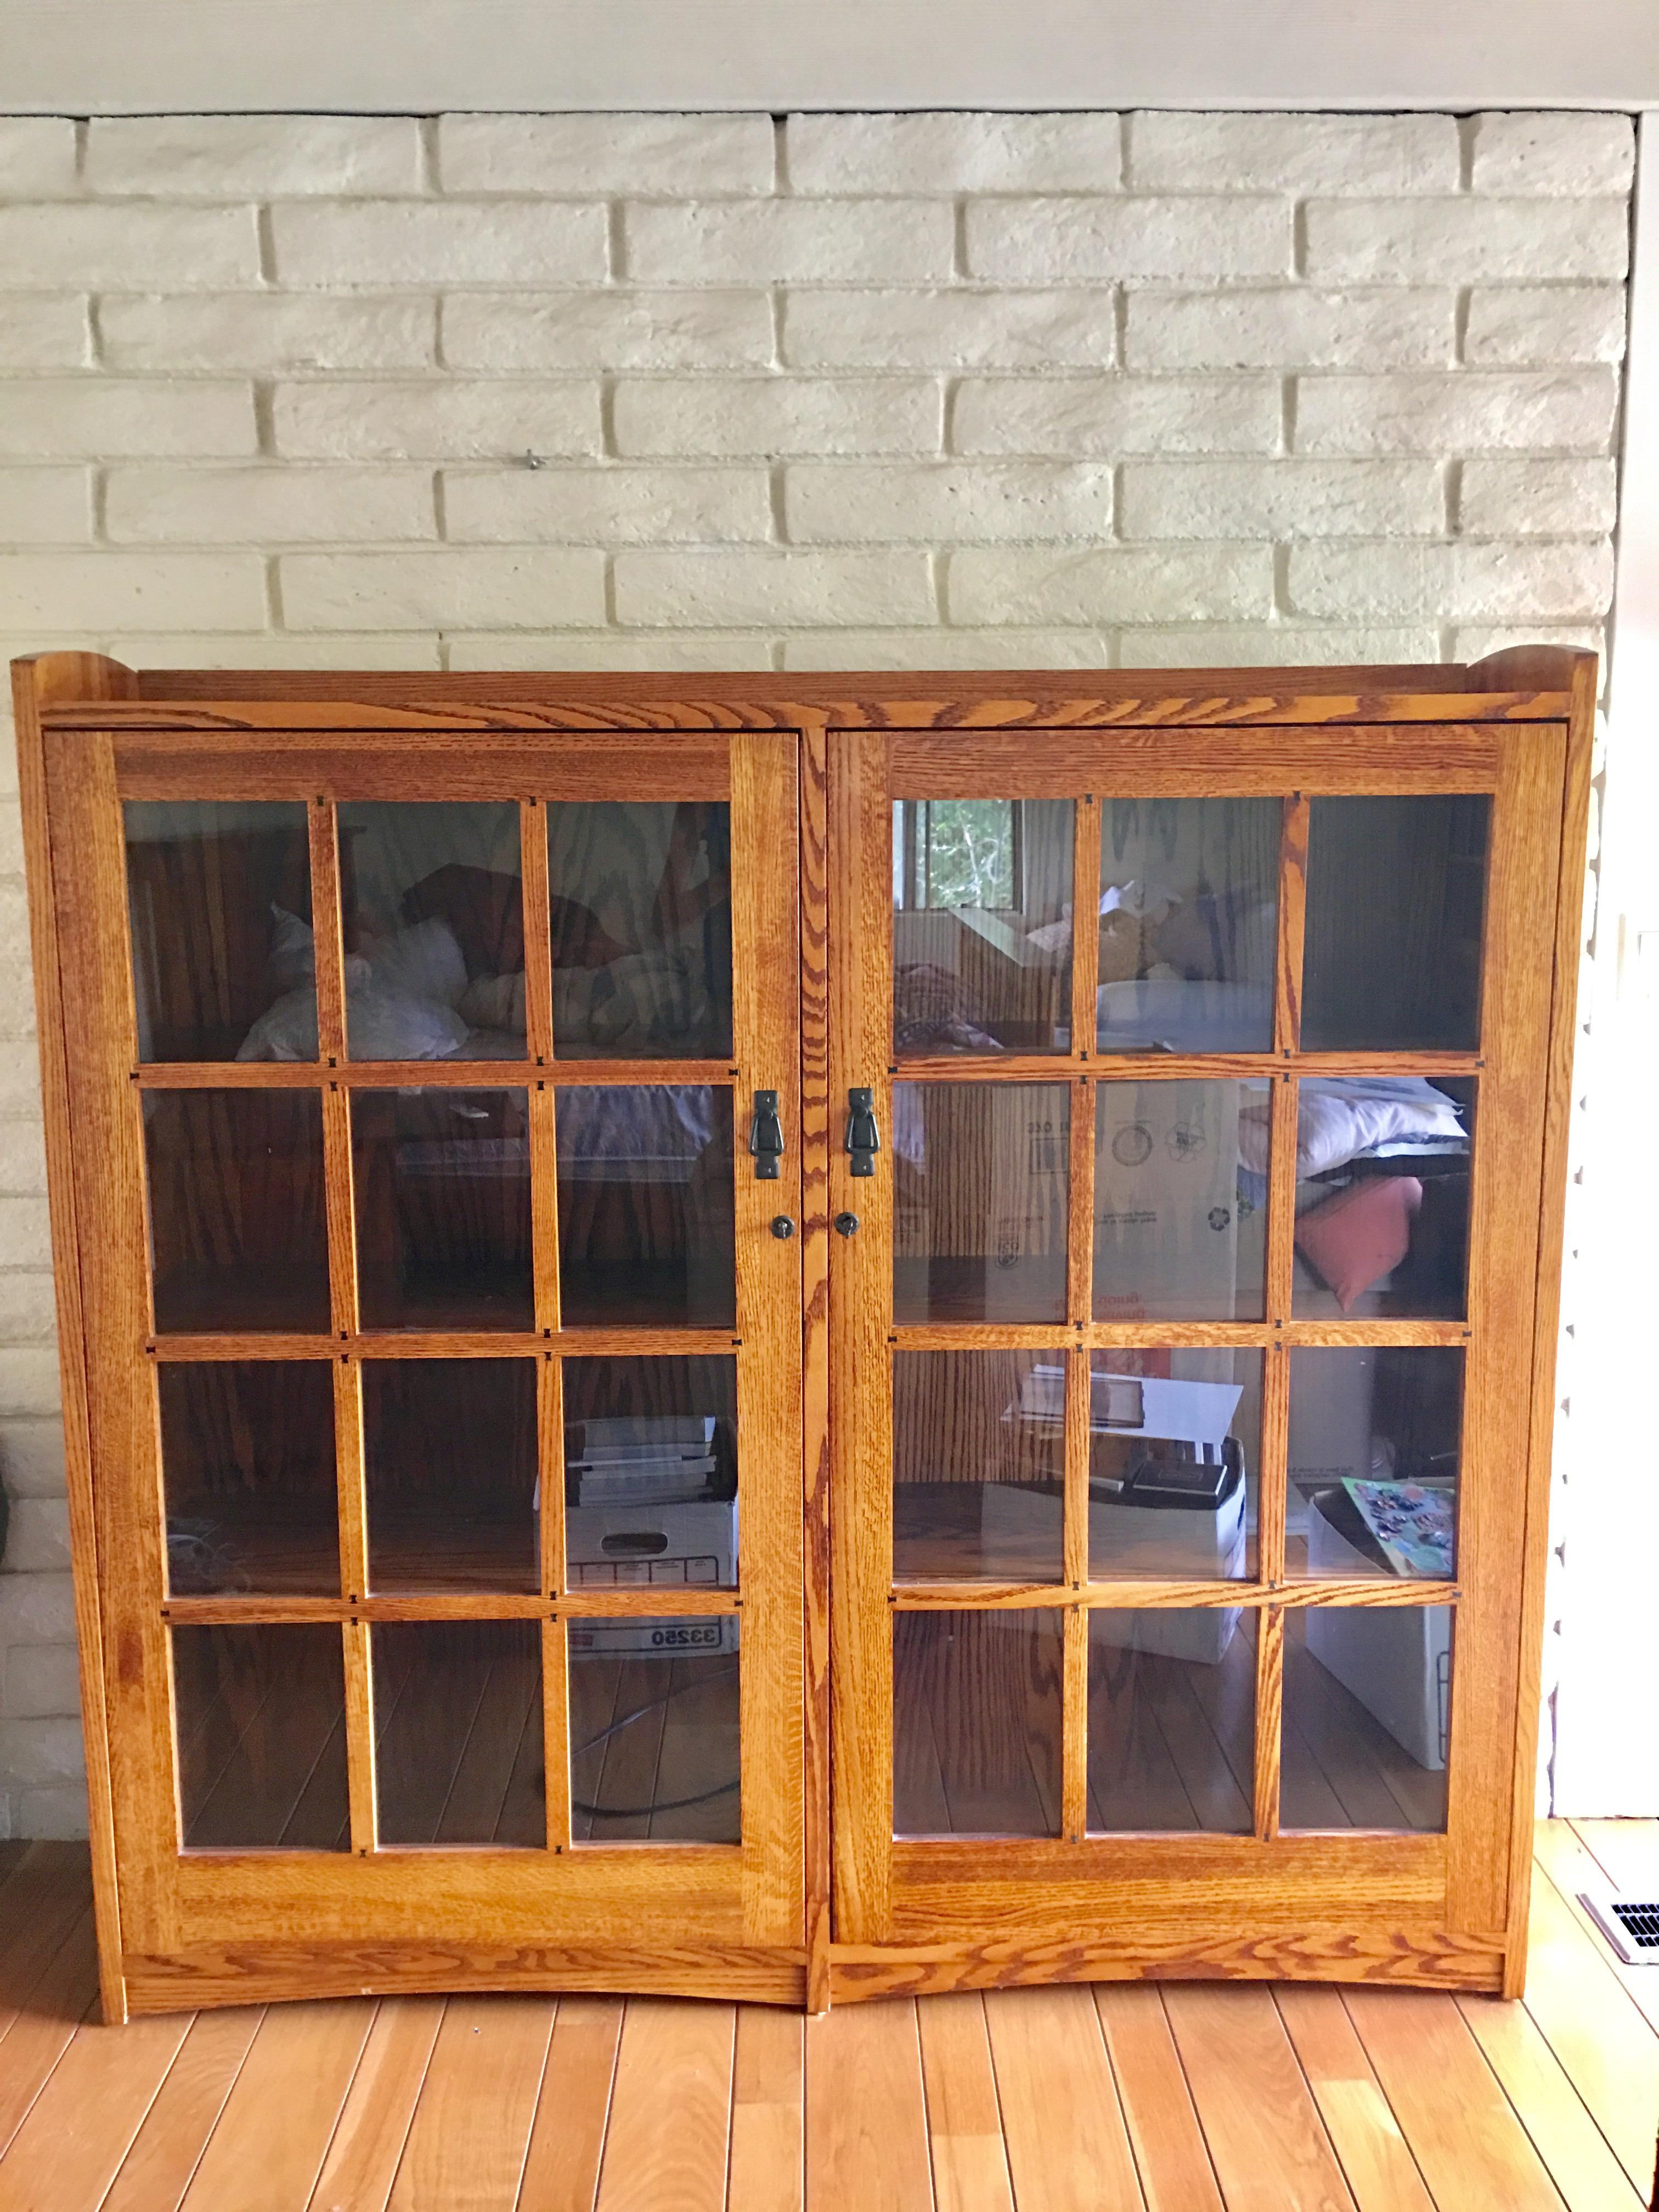 restoration hardware mission style oak u0026 glass bookcase image 2